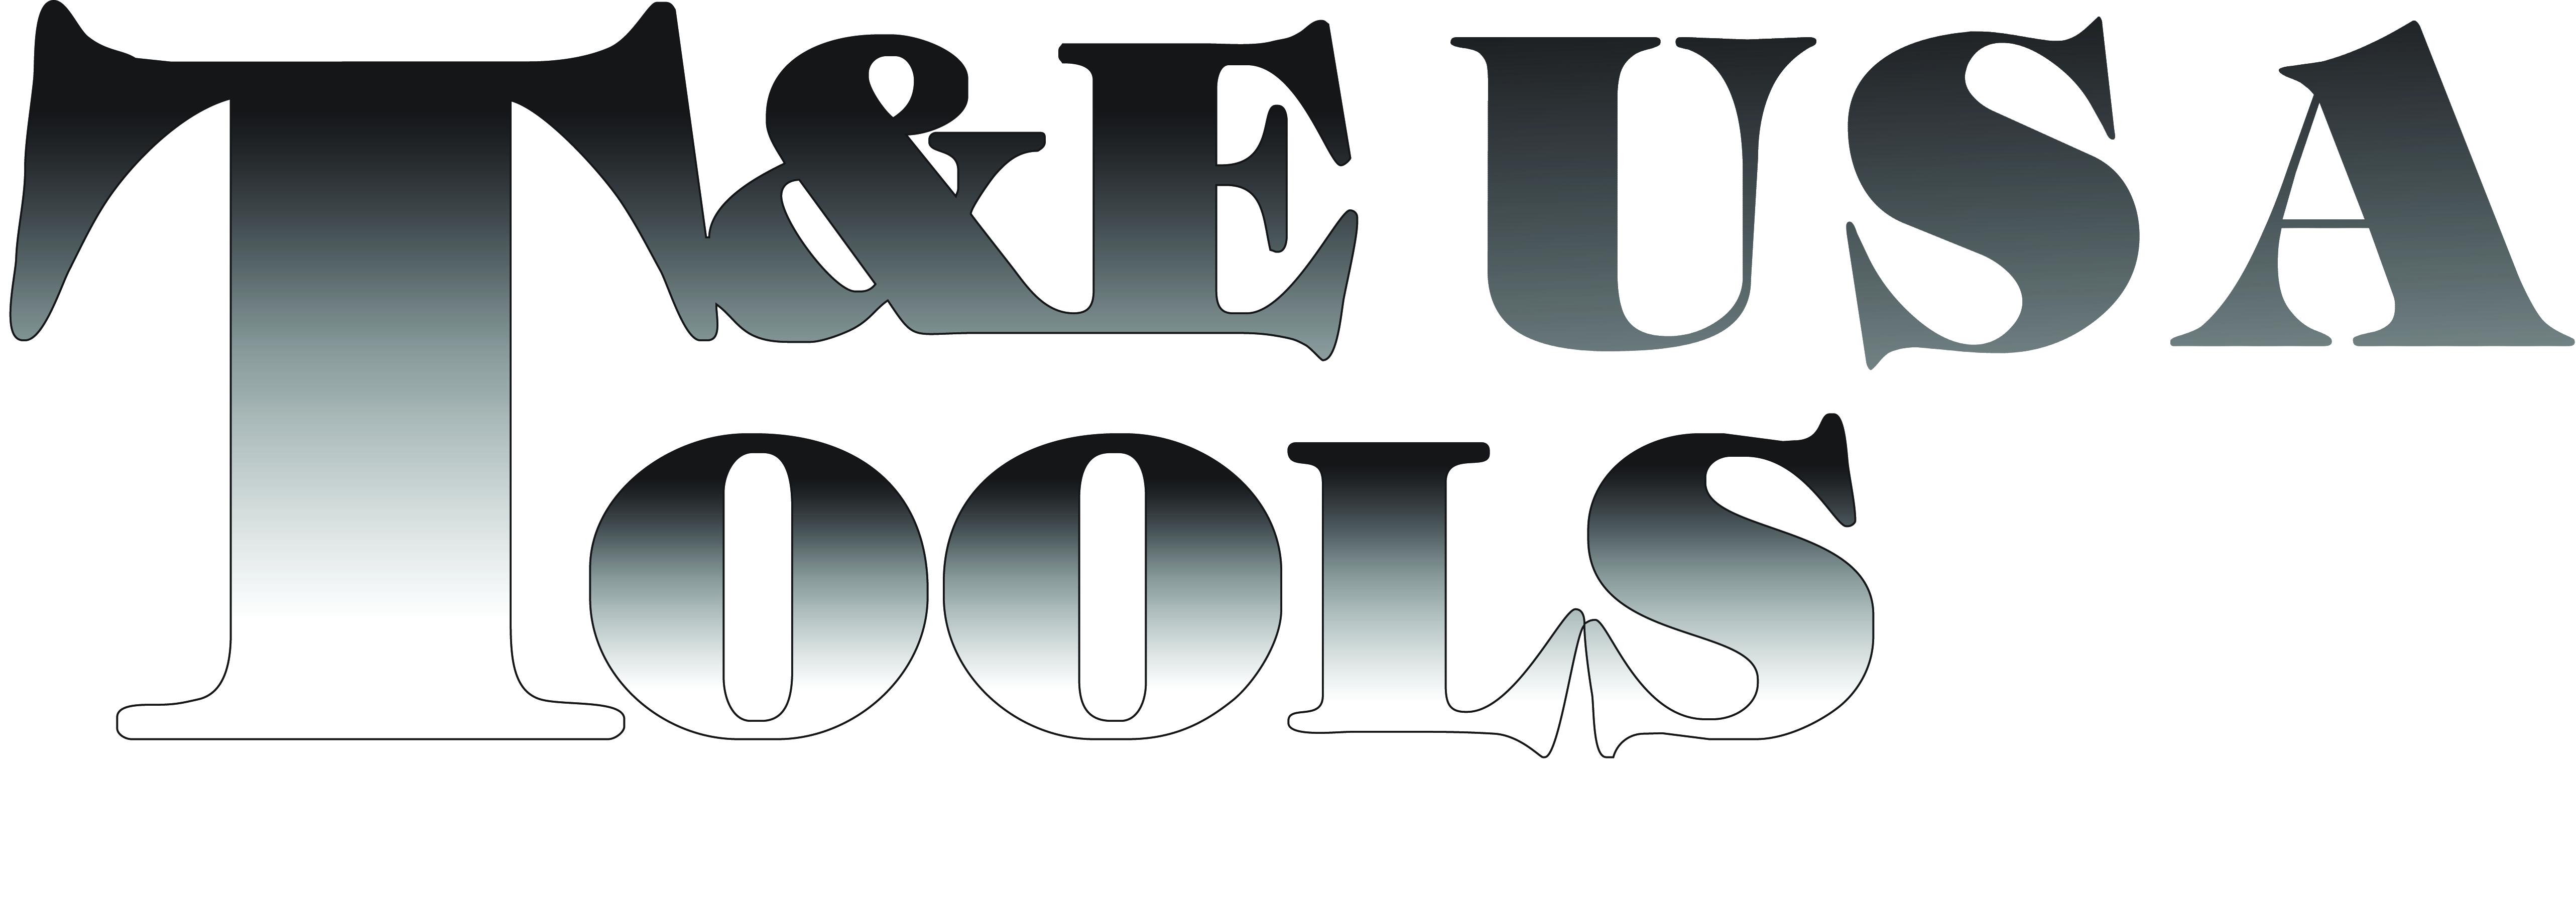 t-e-tools-black-and-white.jpg